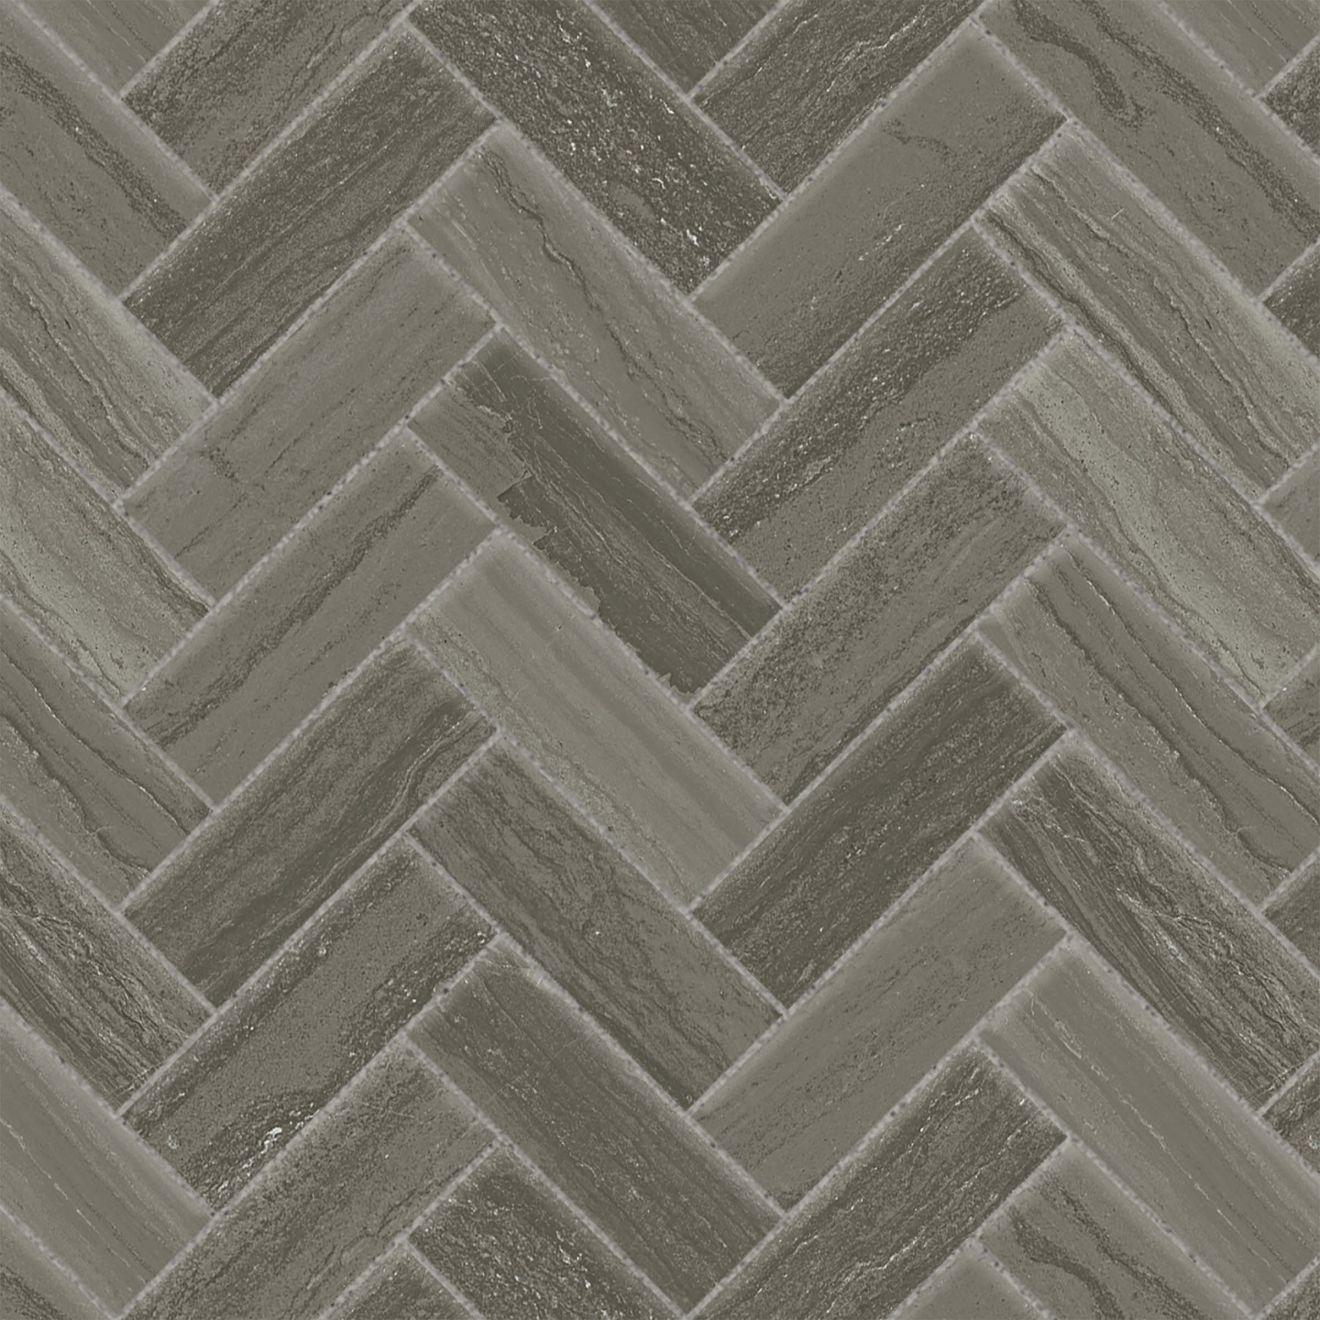 "Highland 1"" x 4"" Floor & Wall Mosaic in Dark Greige"